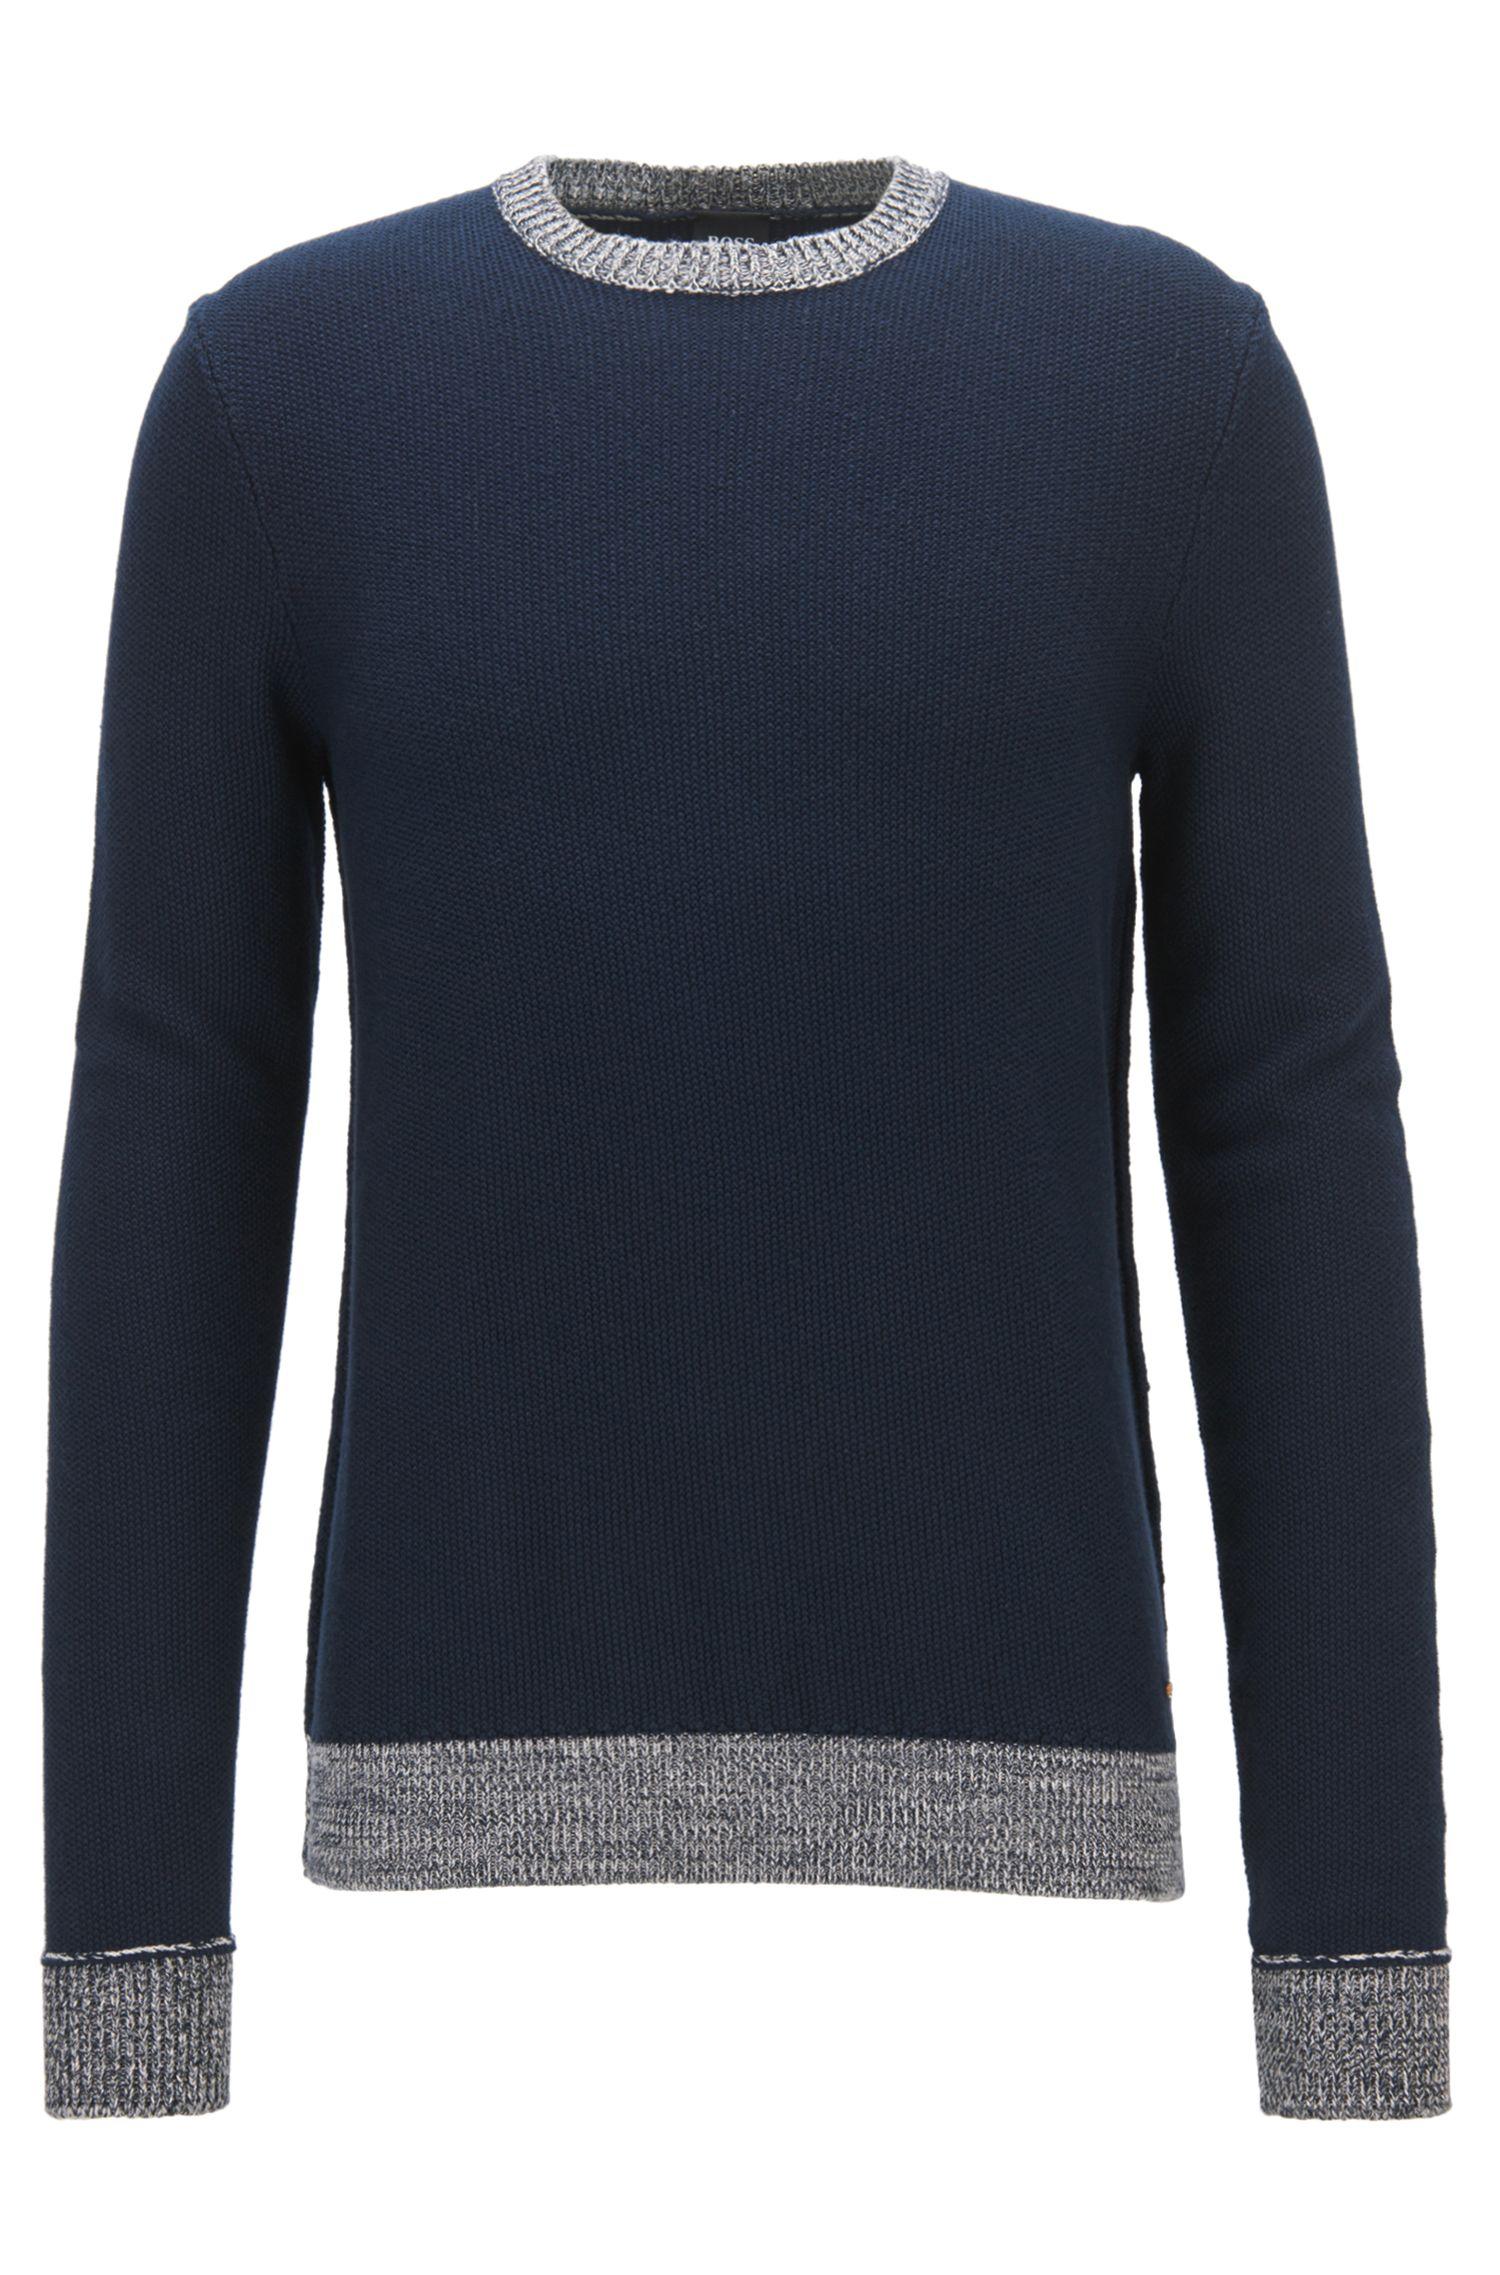 Strukturierter Pullover aus Baumwolle mit kontrastfarbenem Mouliné-Saum